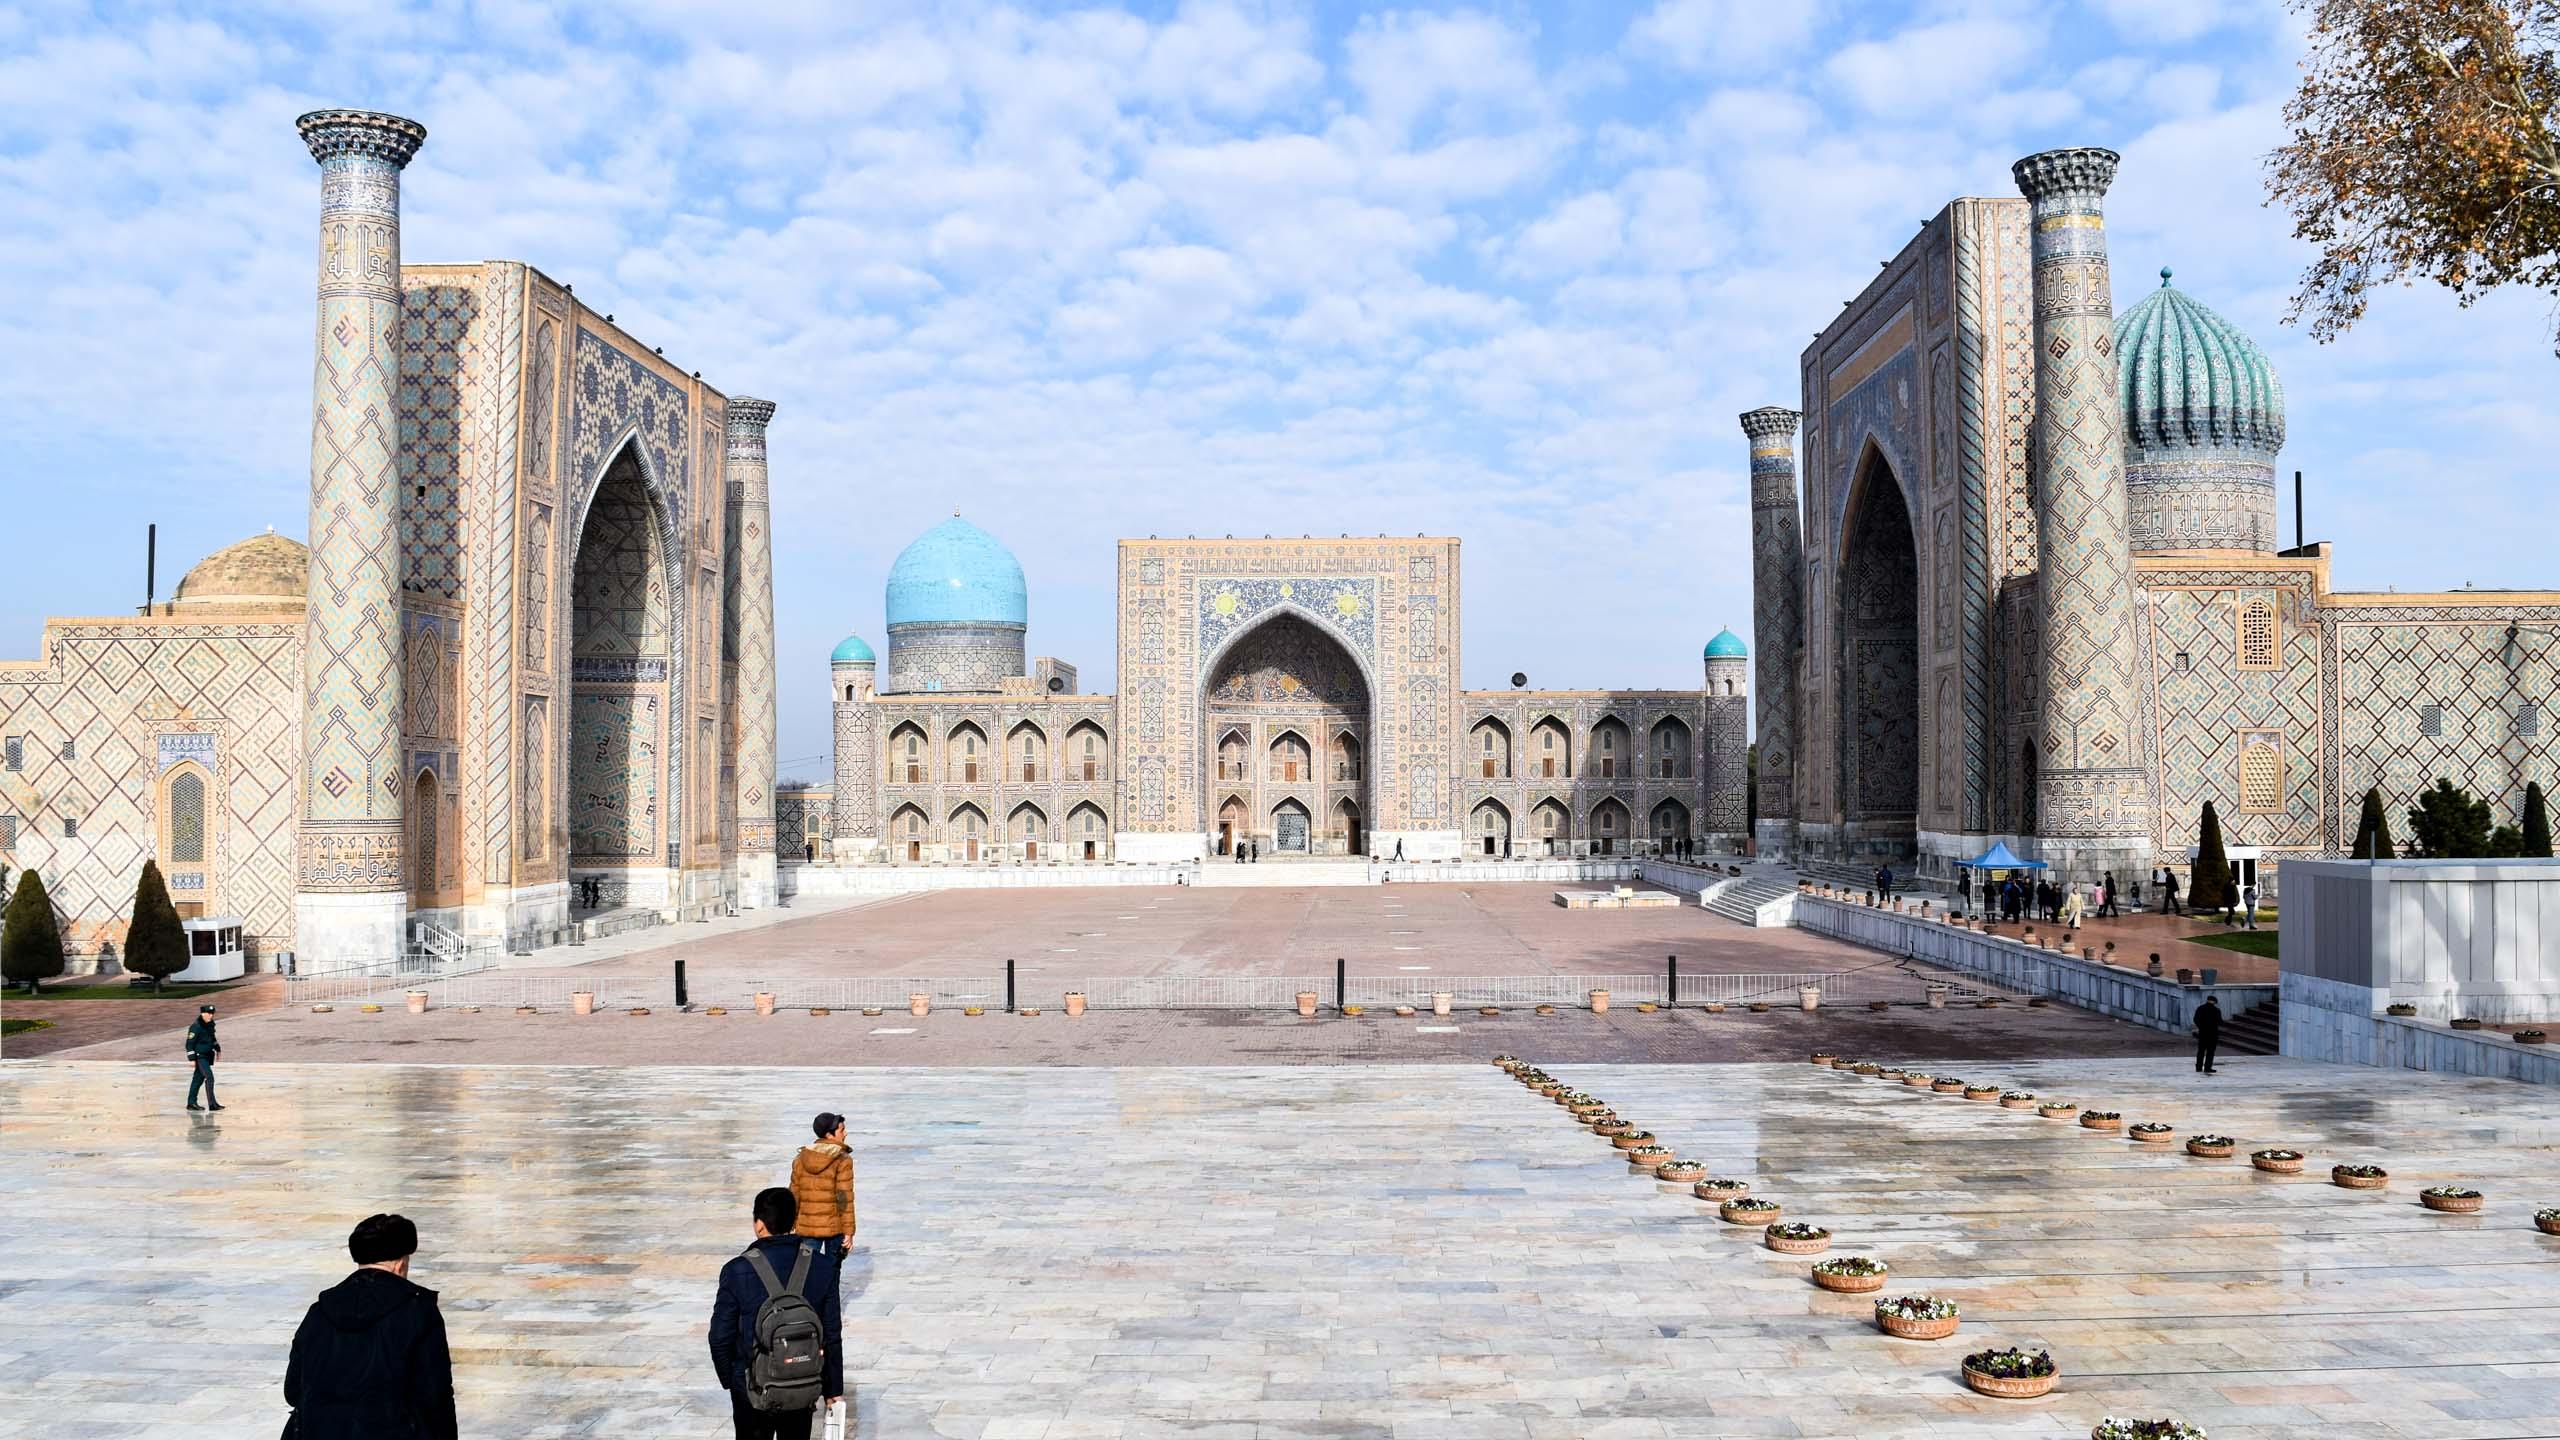 Khudayar Khan Palace in Uzbekistan